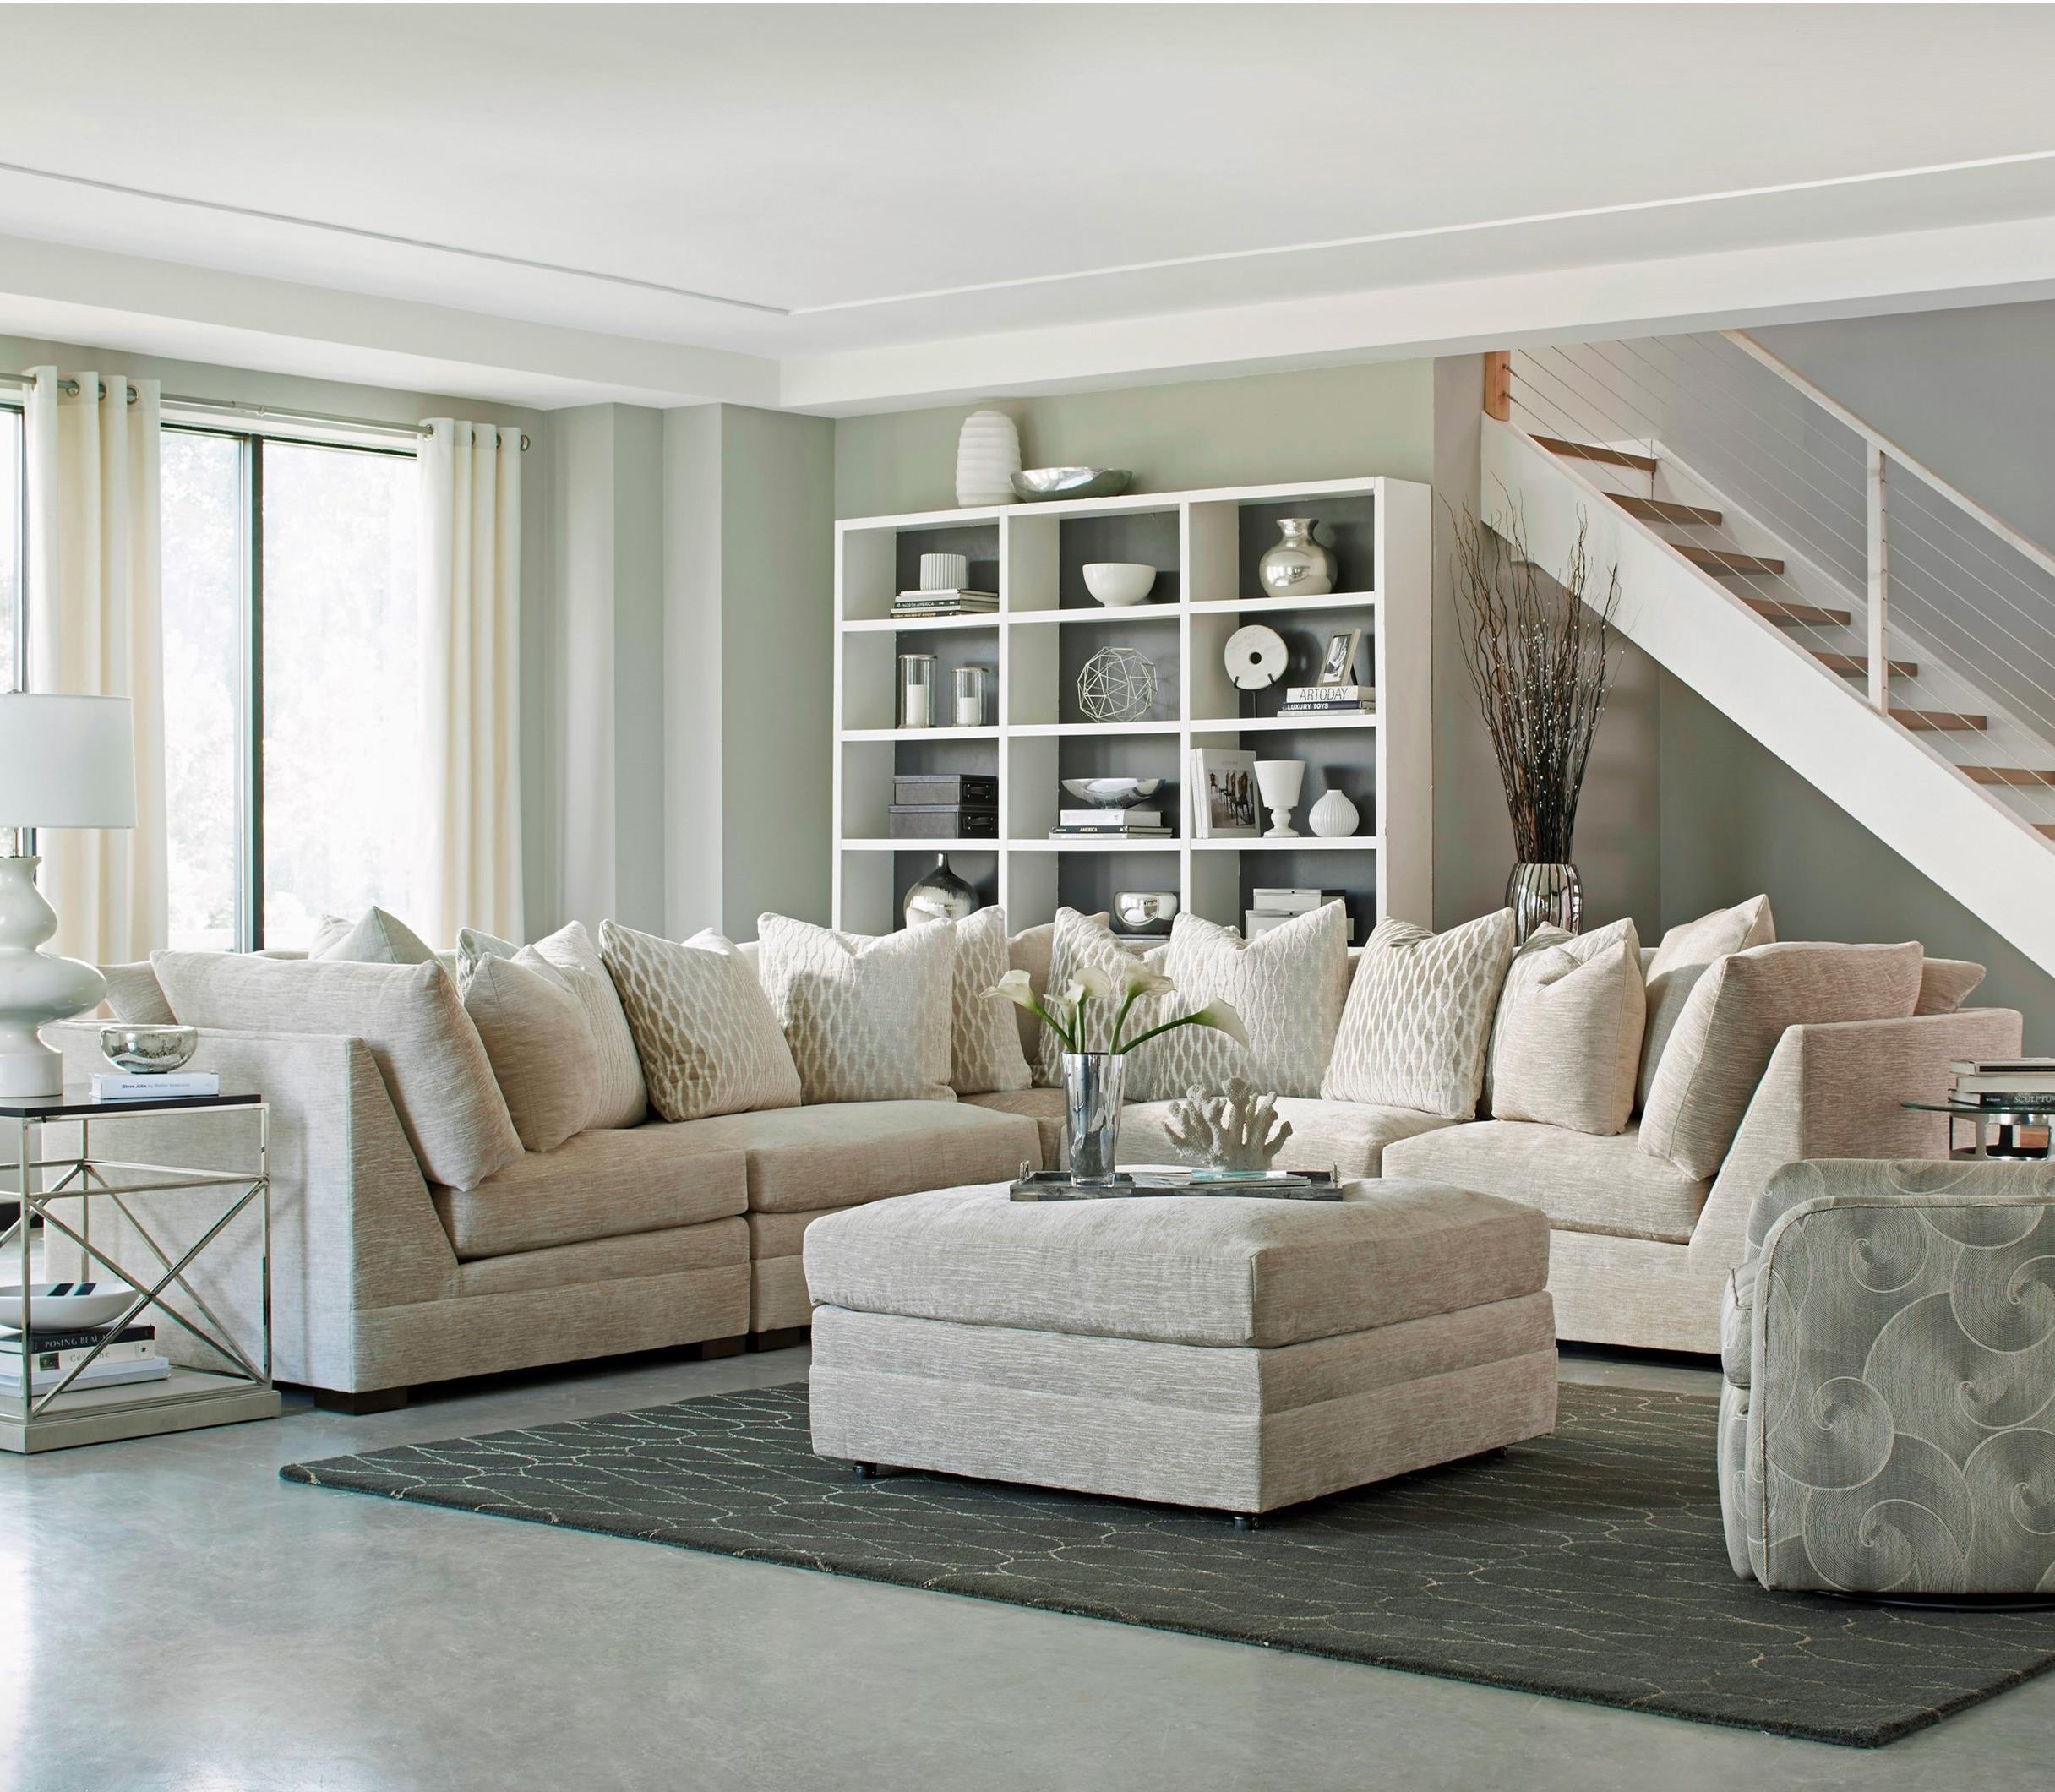 7100 5 Pc Sectional Sofa by Geoffrey Alexander at Sprintz Furniture